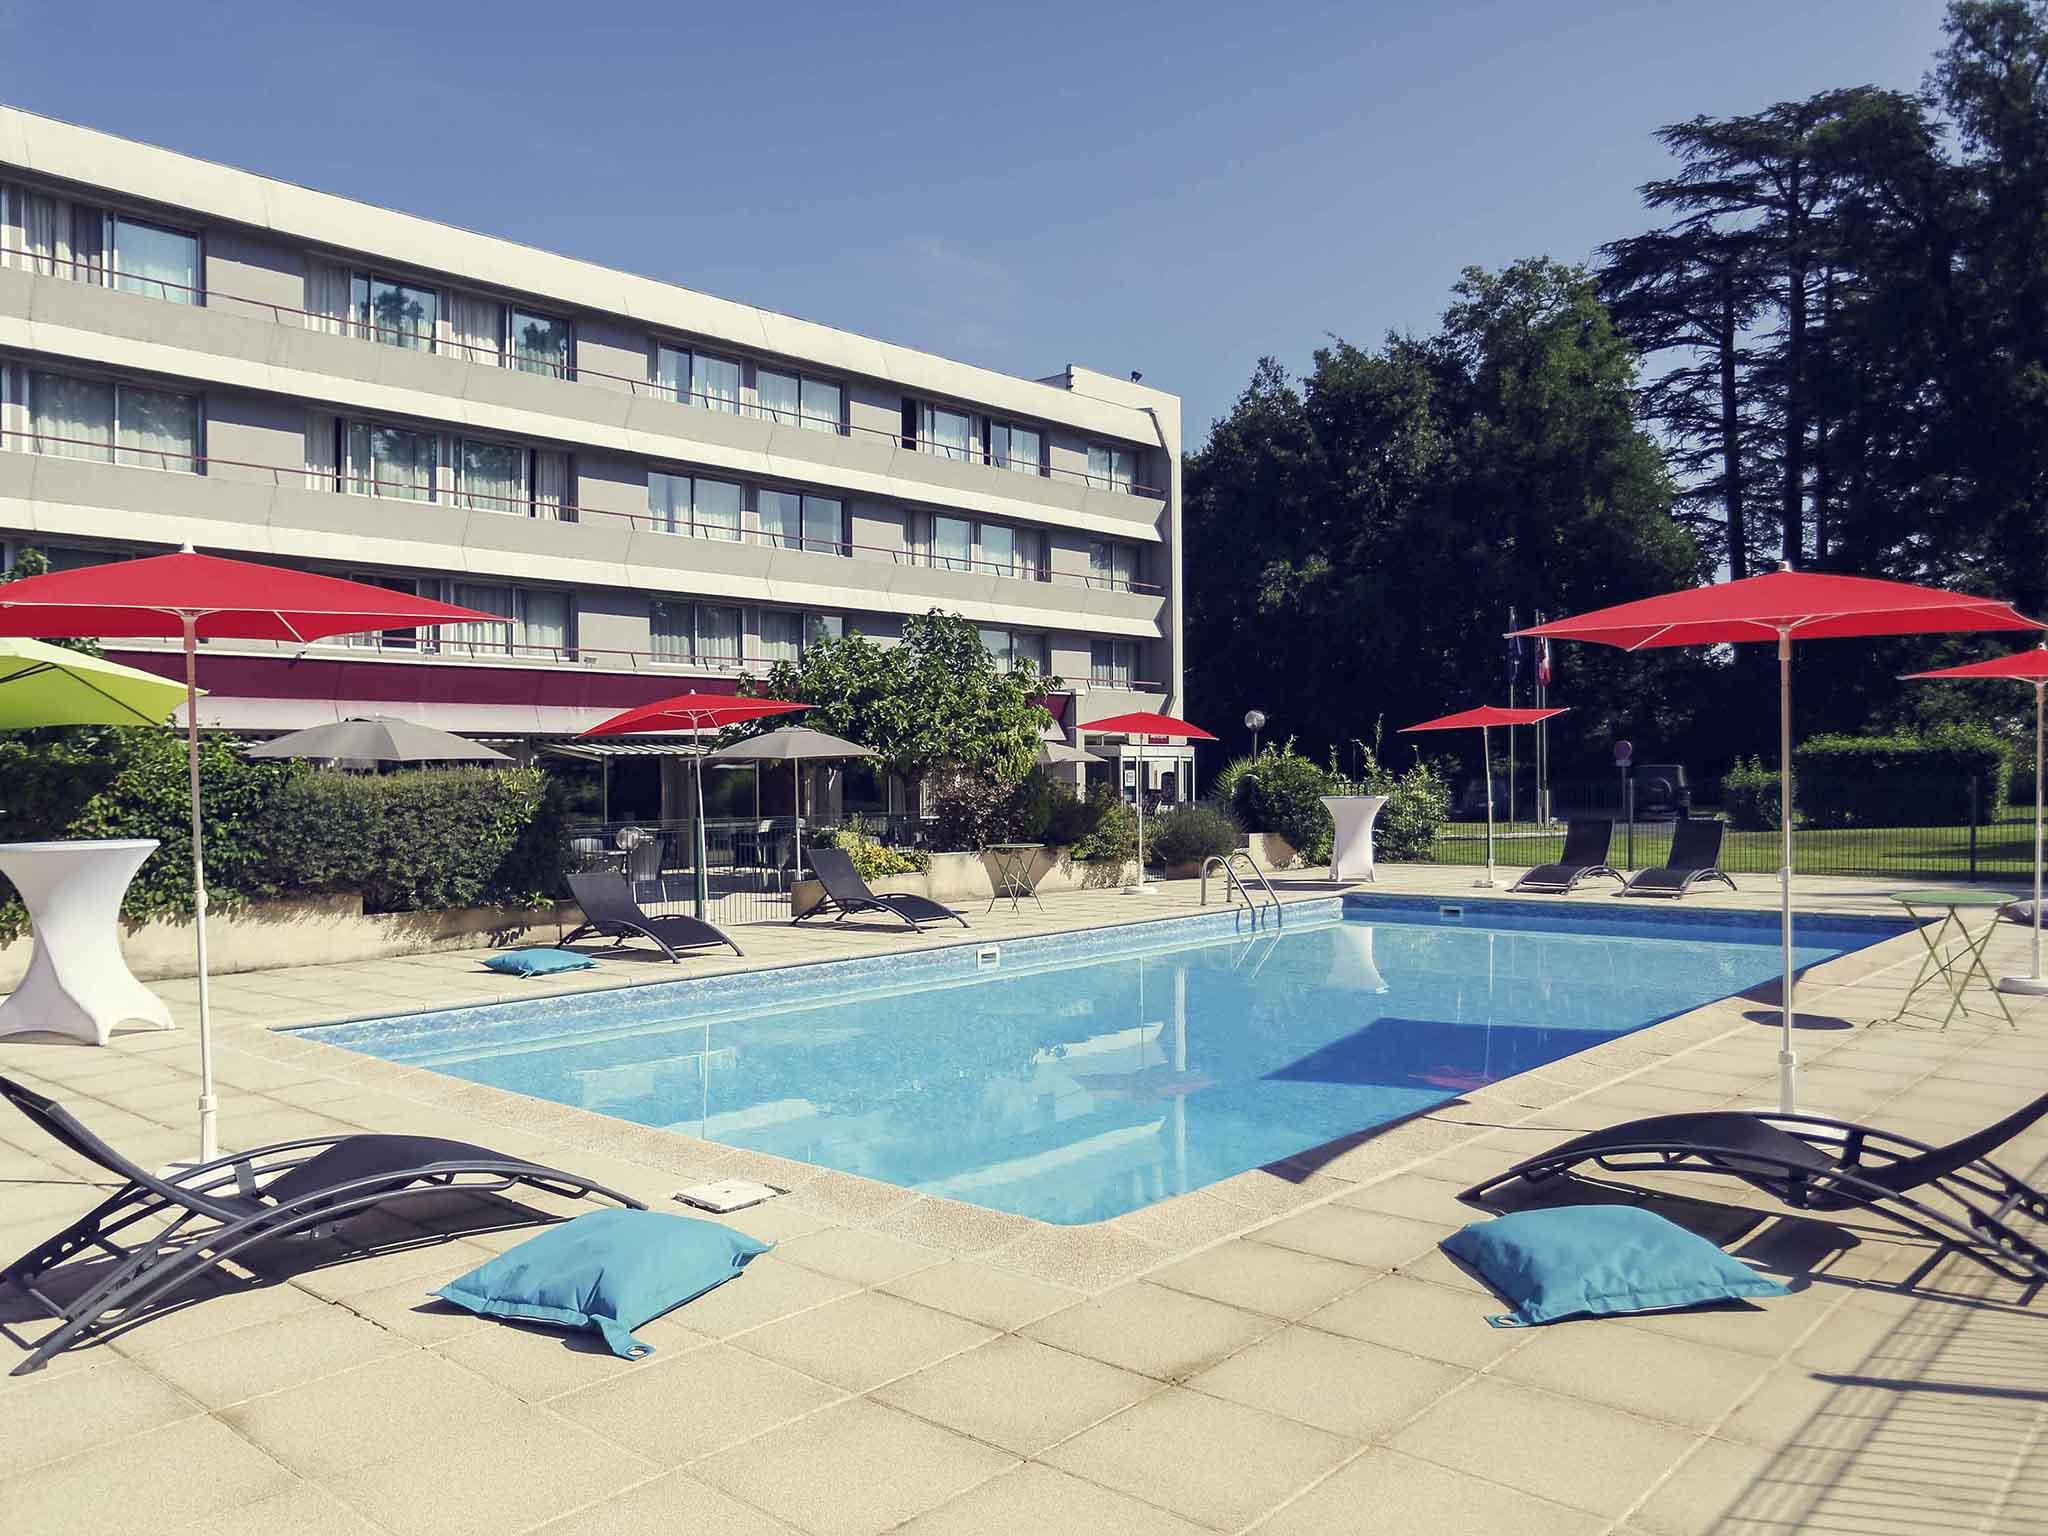 Hotel – Hôtel Mercure Brive